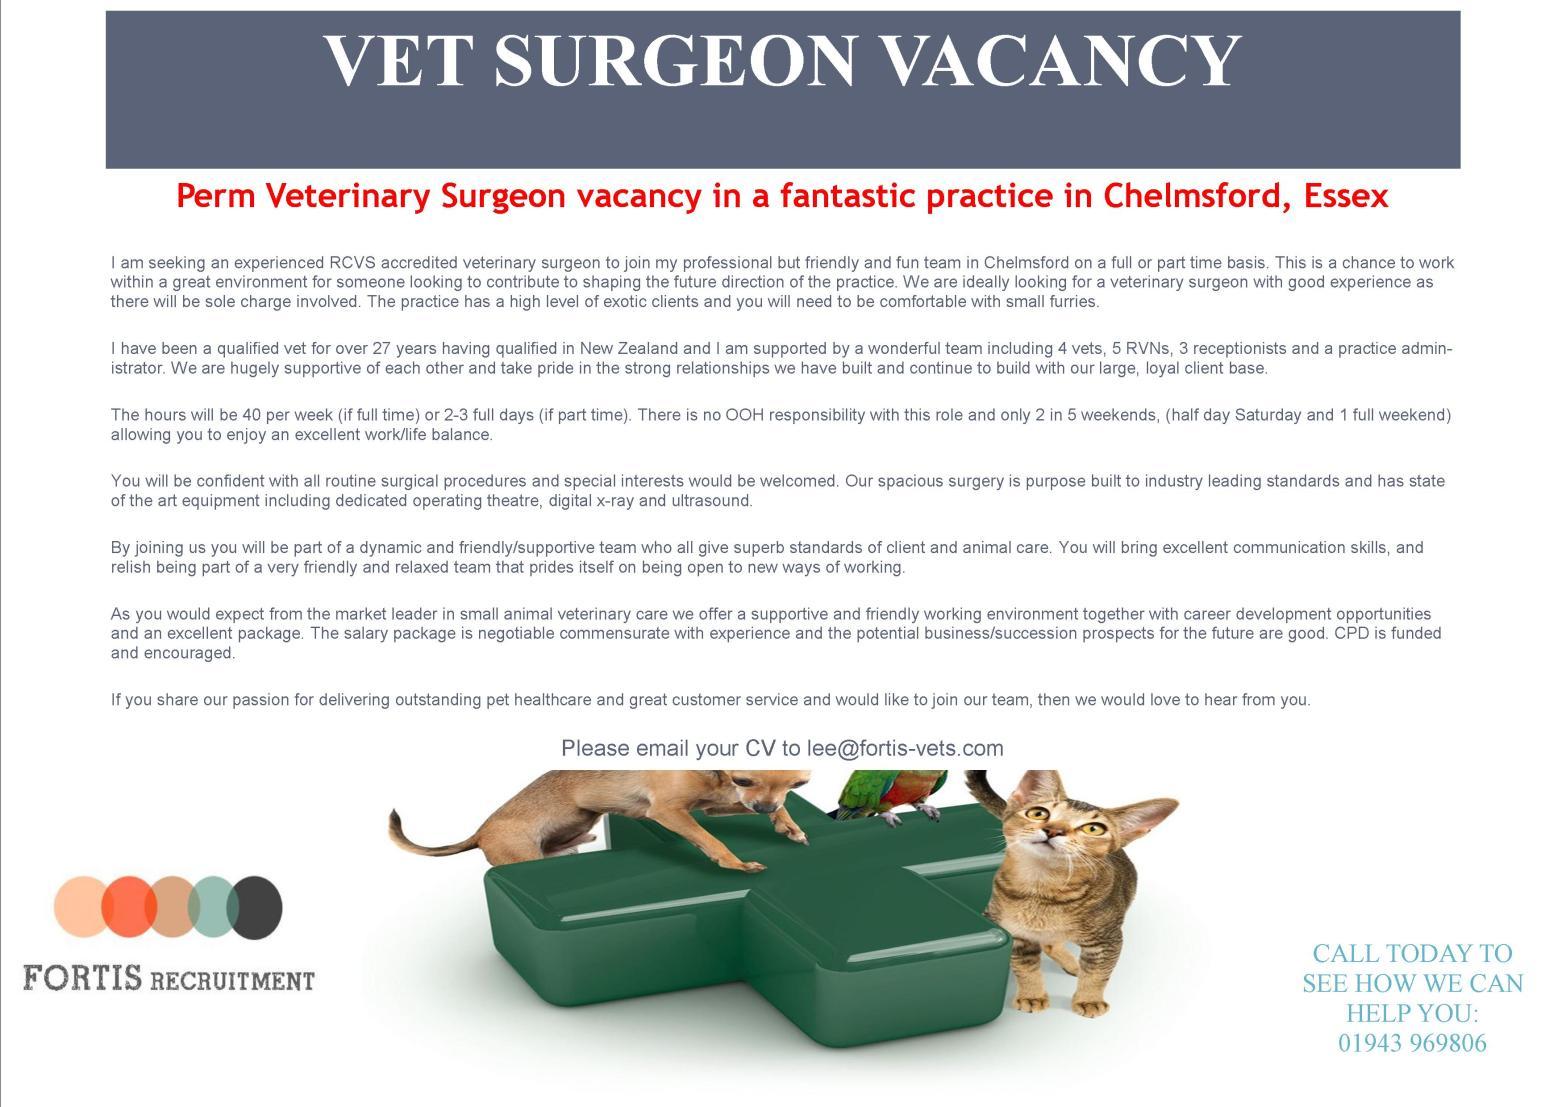 Perm Veterinary Surgeon vacancy in a fantastic practice in Chelmsford, Essex.jpg